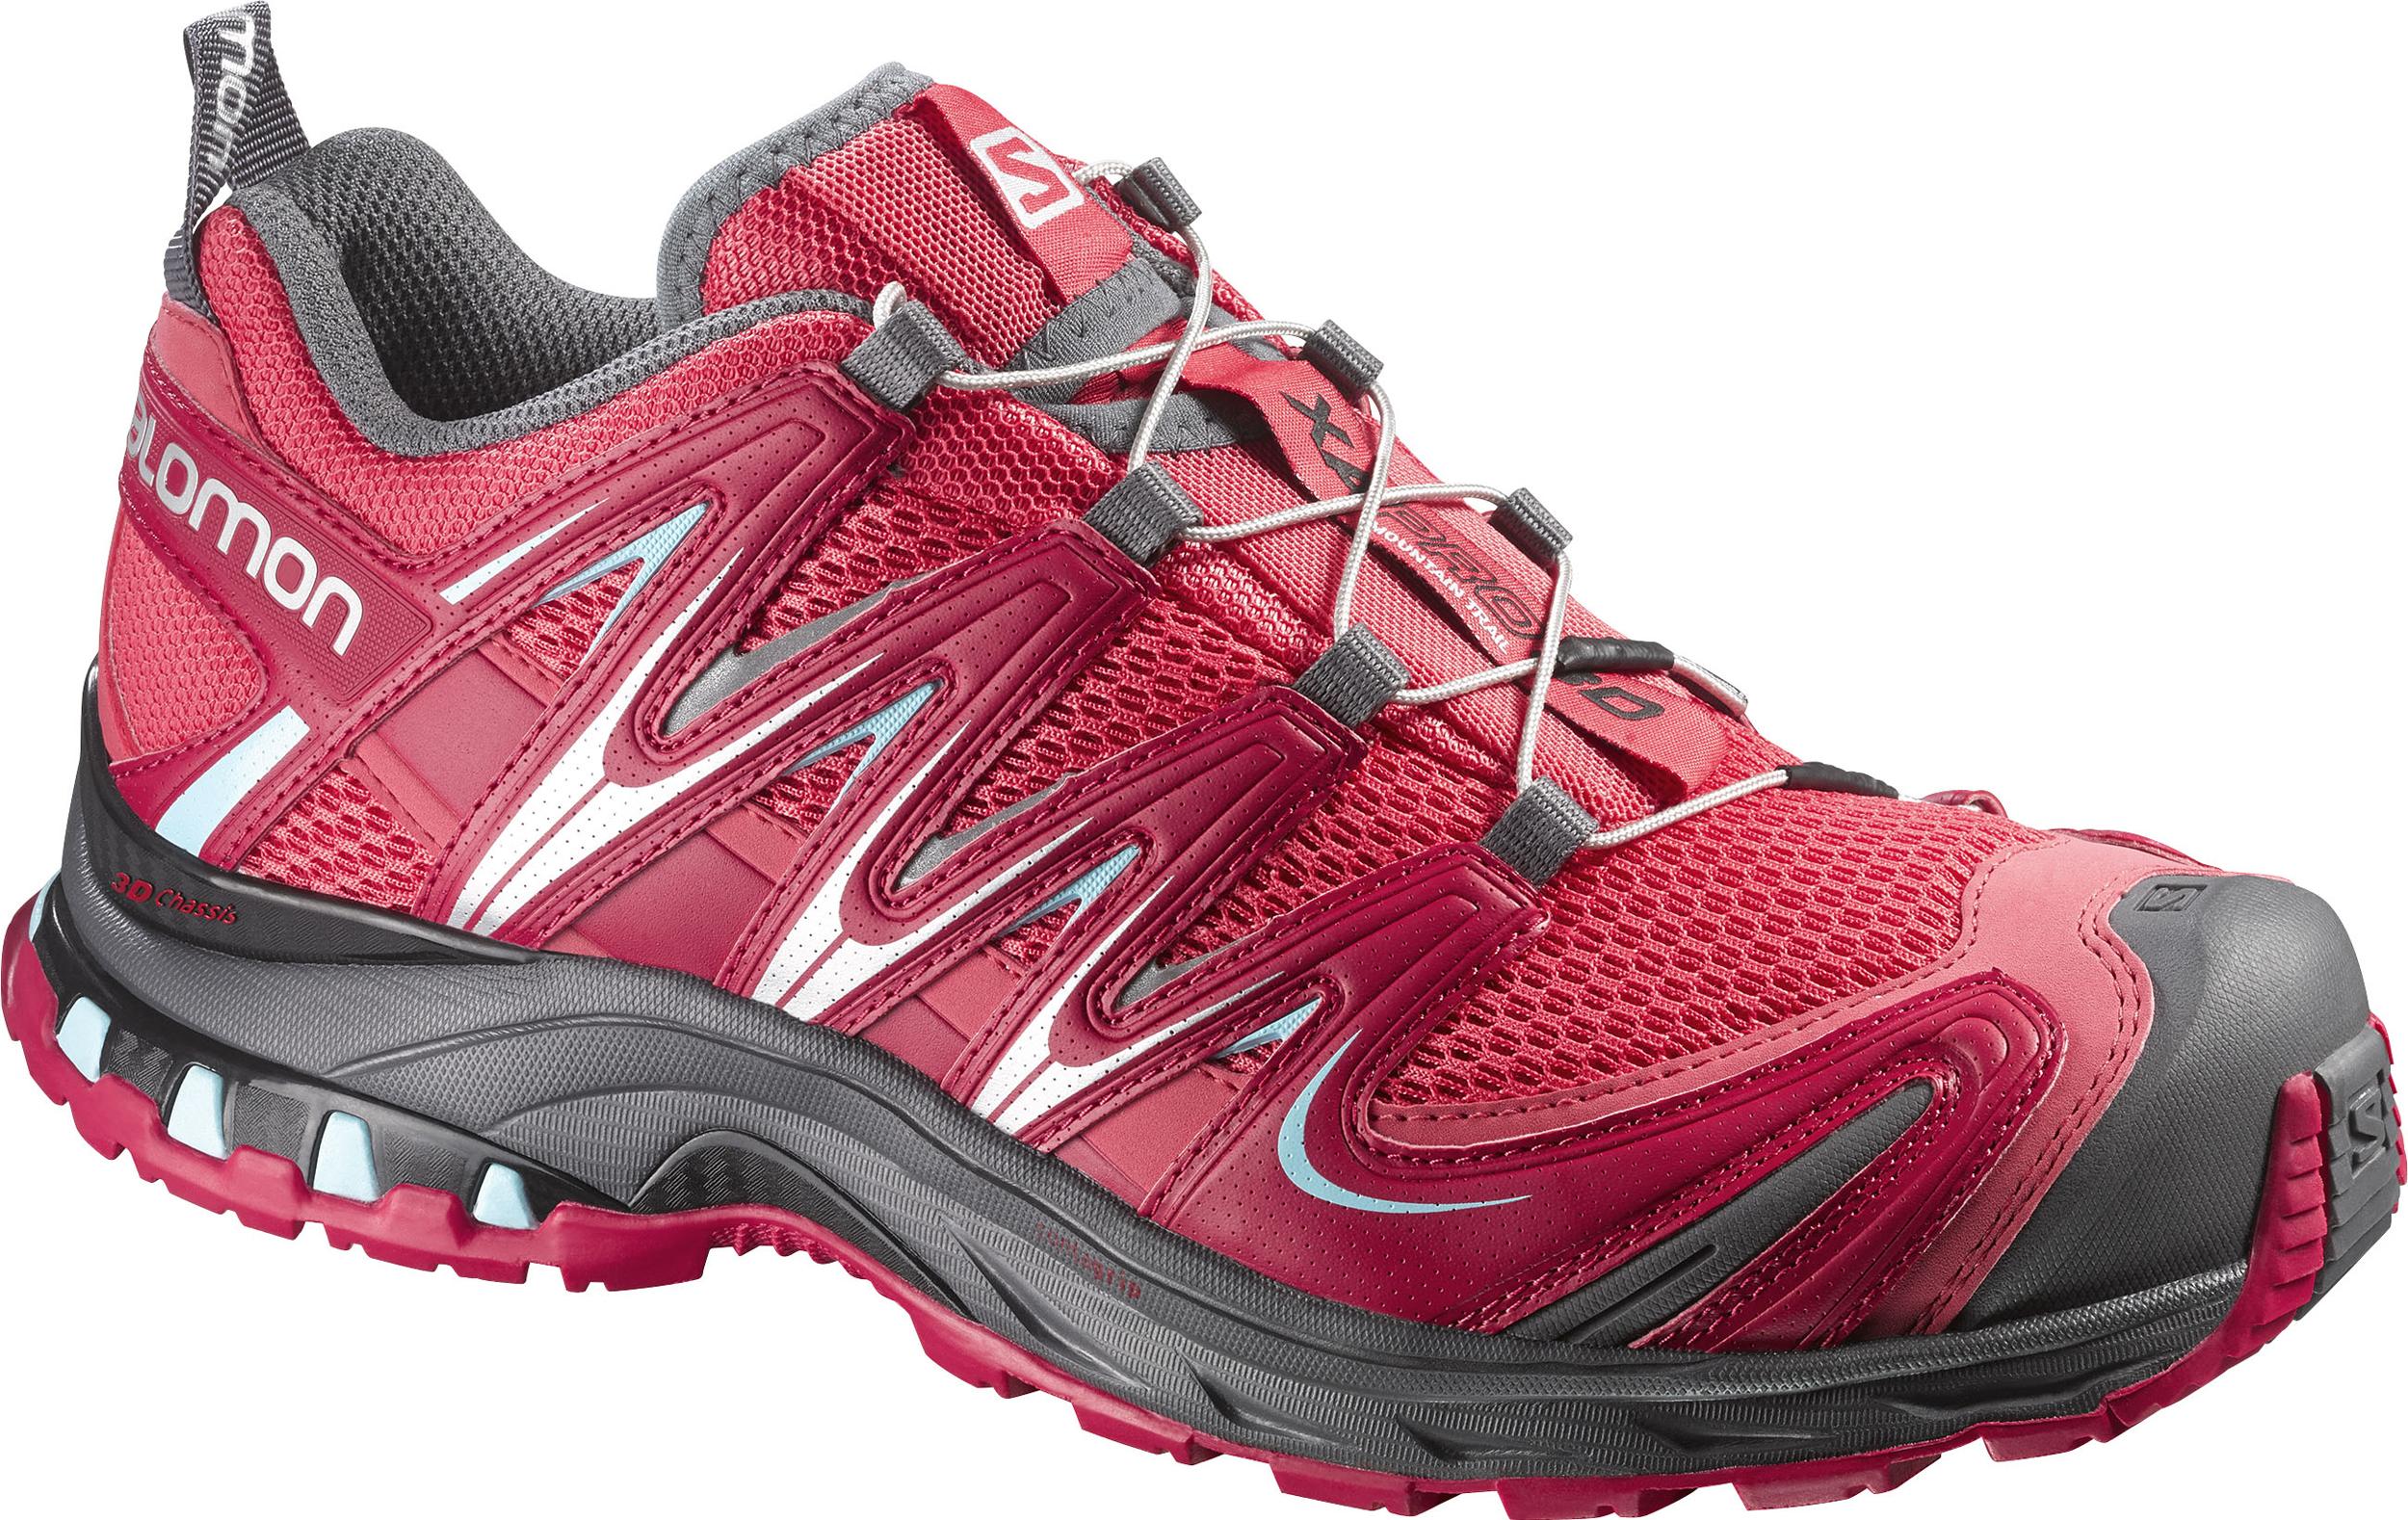 877e9dc52611 Salomon Xa Pro 3D Trail Running Shoes - Women s